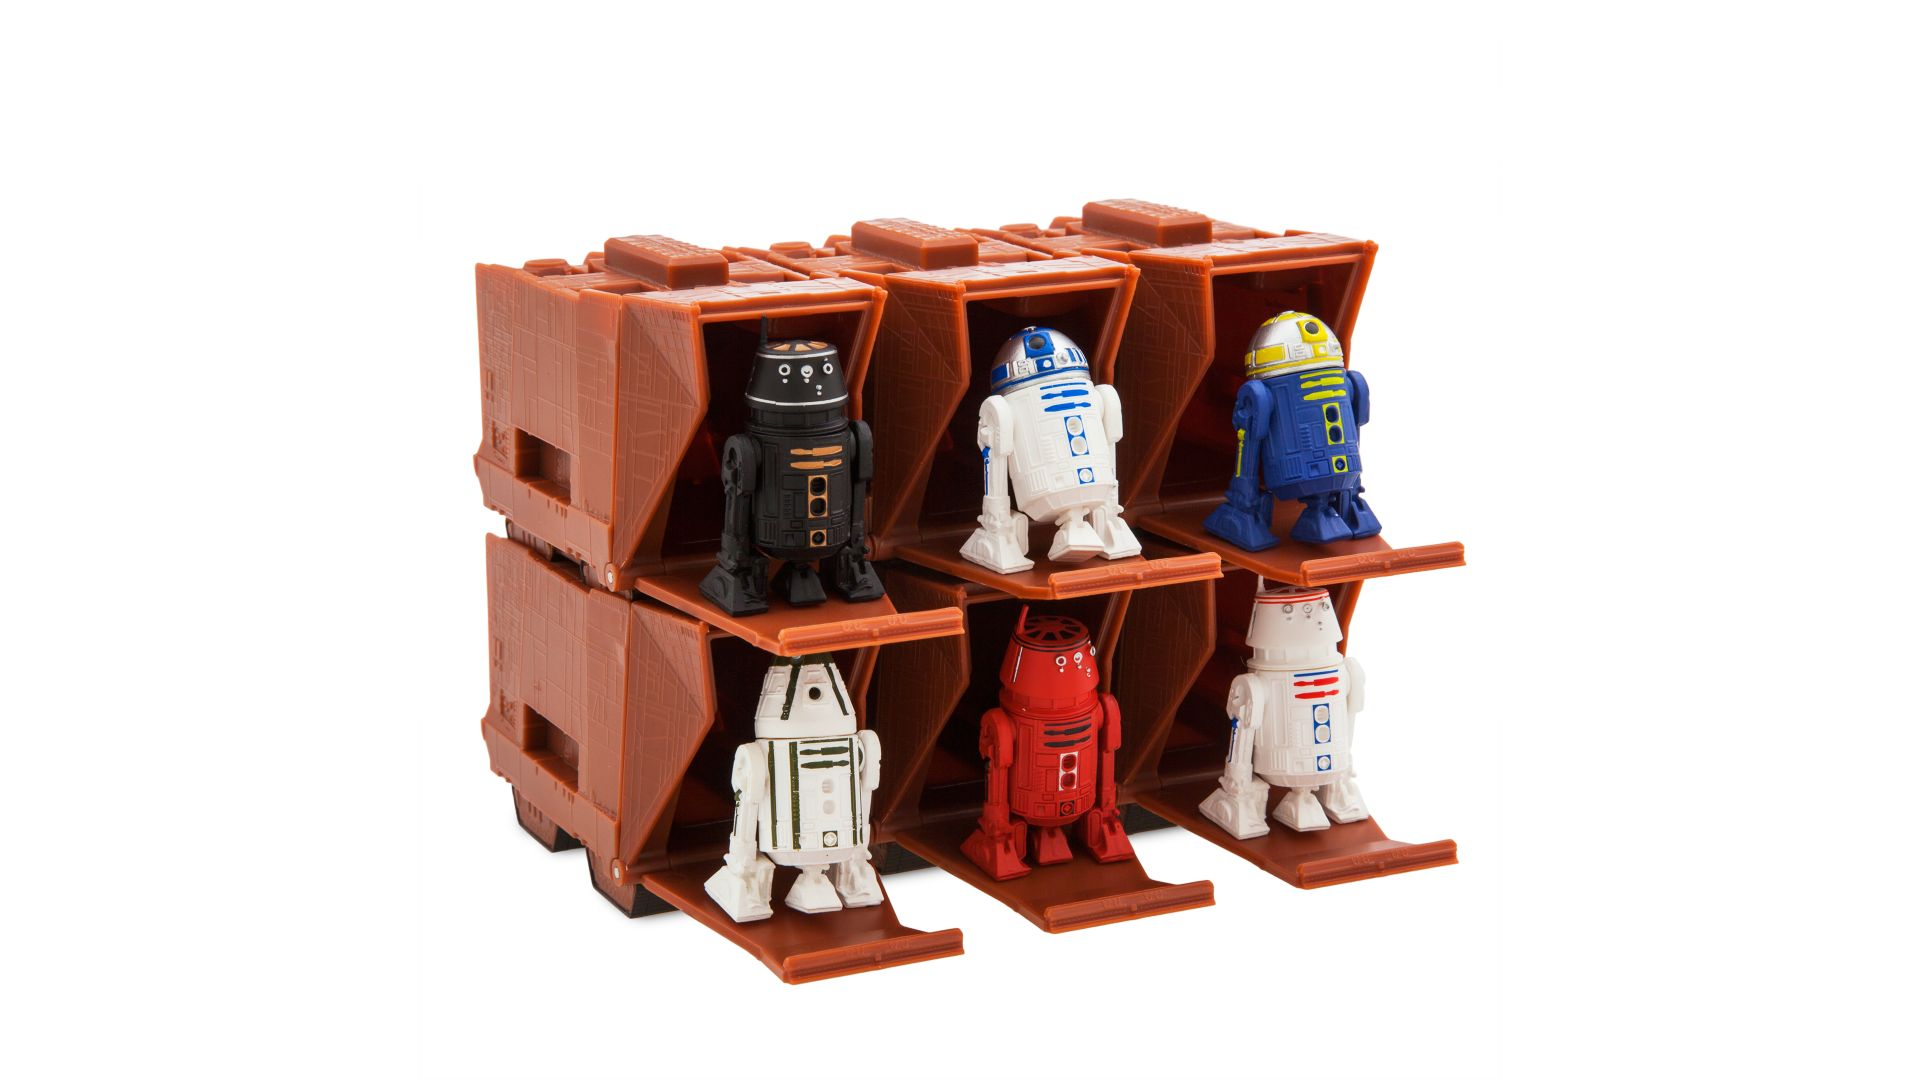 Star Wars Mini Droid Blind Packs Coming Soon